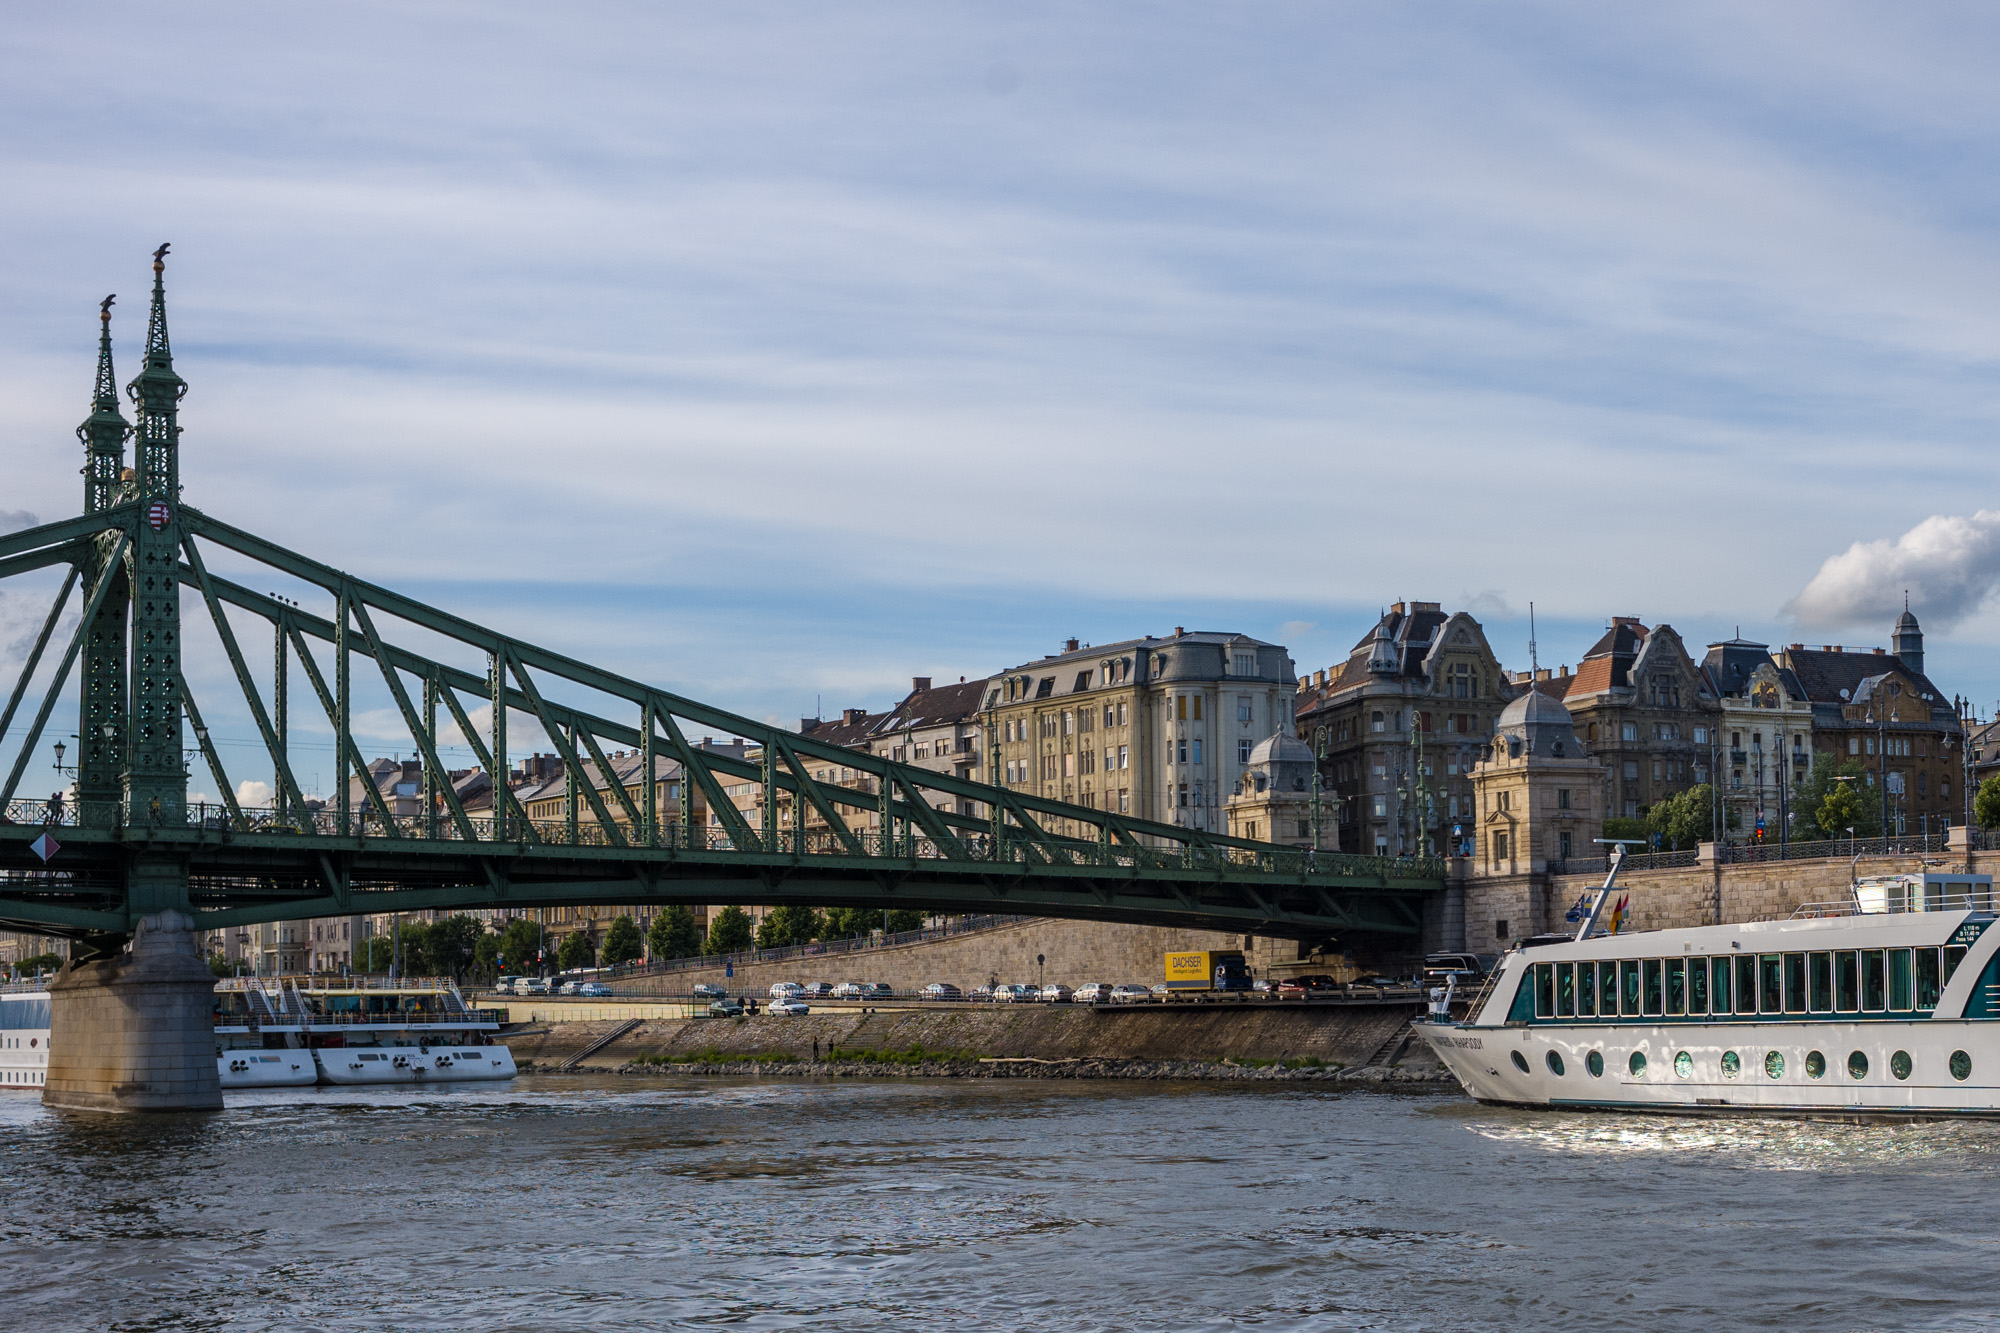 Cruising under a bridge floating on the Blue Danube